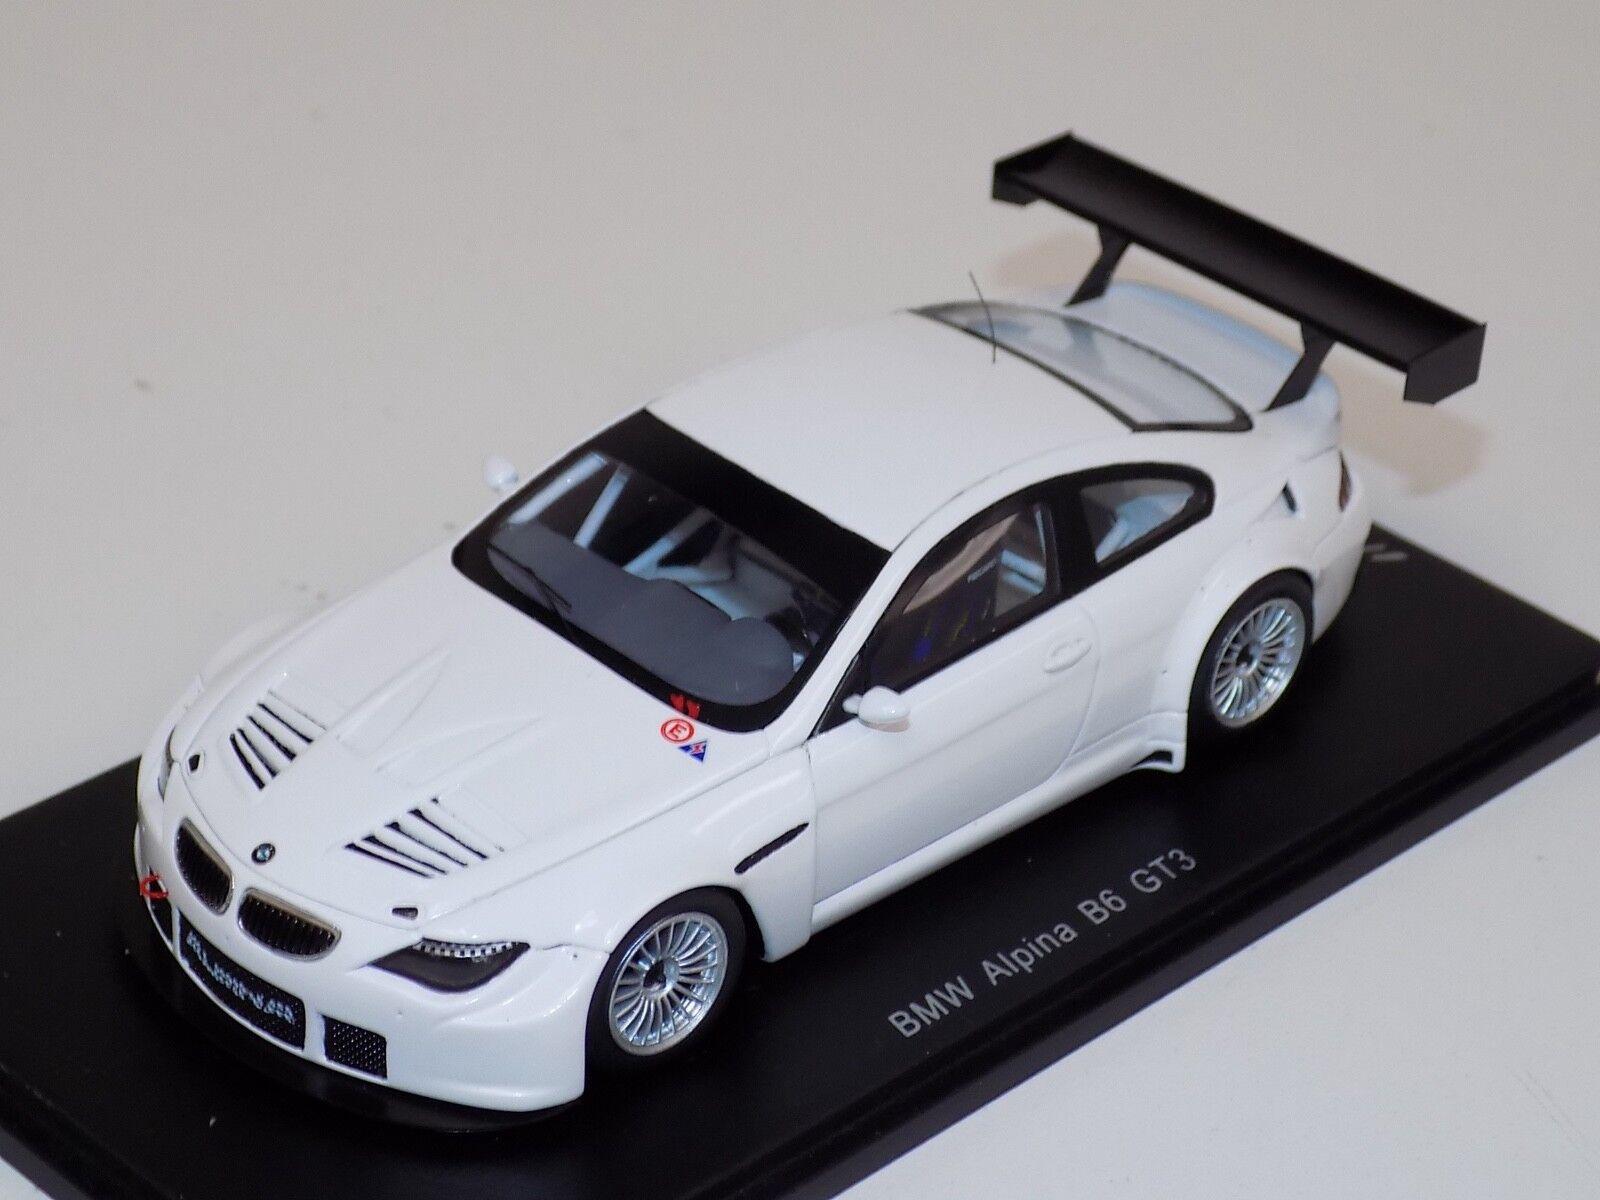 1 43 Spark BMW 6 Series Alpina B6 GT  in White  CA04311010